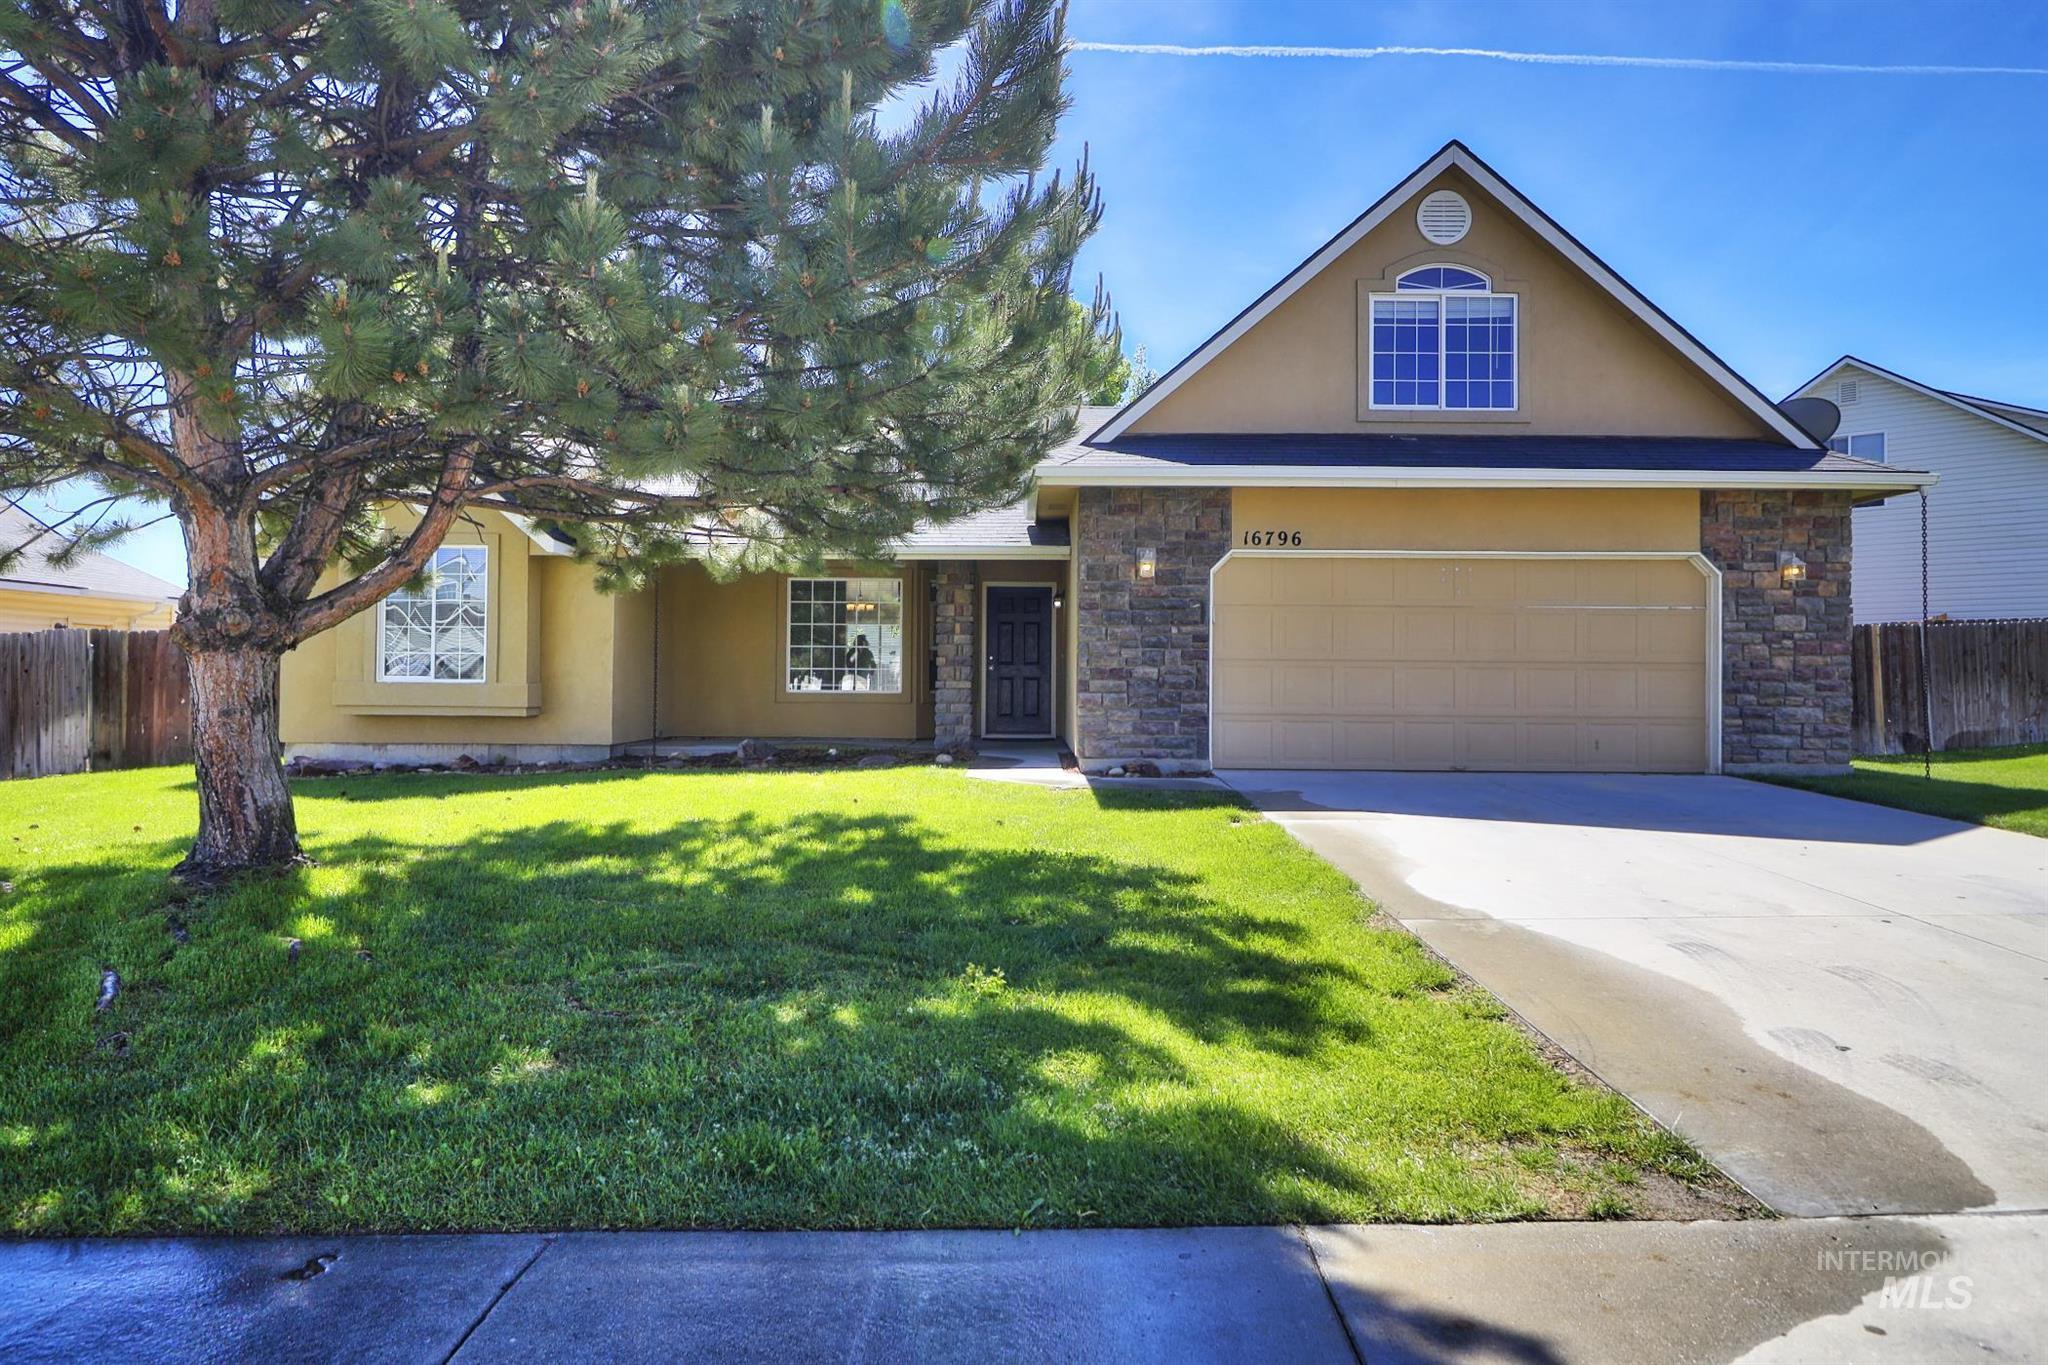 16796 Naito Ave Property Photo - Caldwell, ID real estate listing